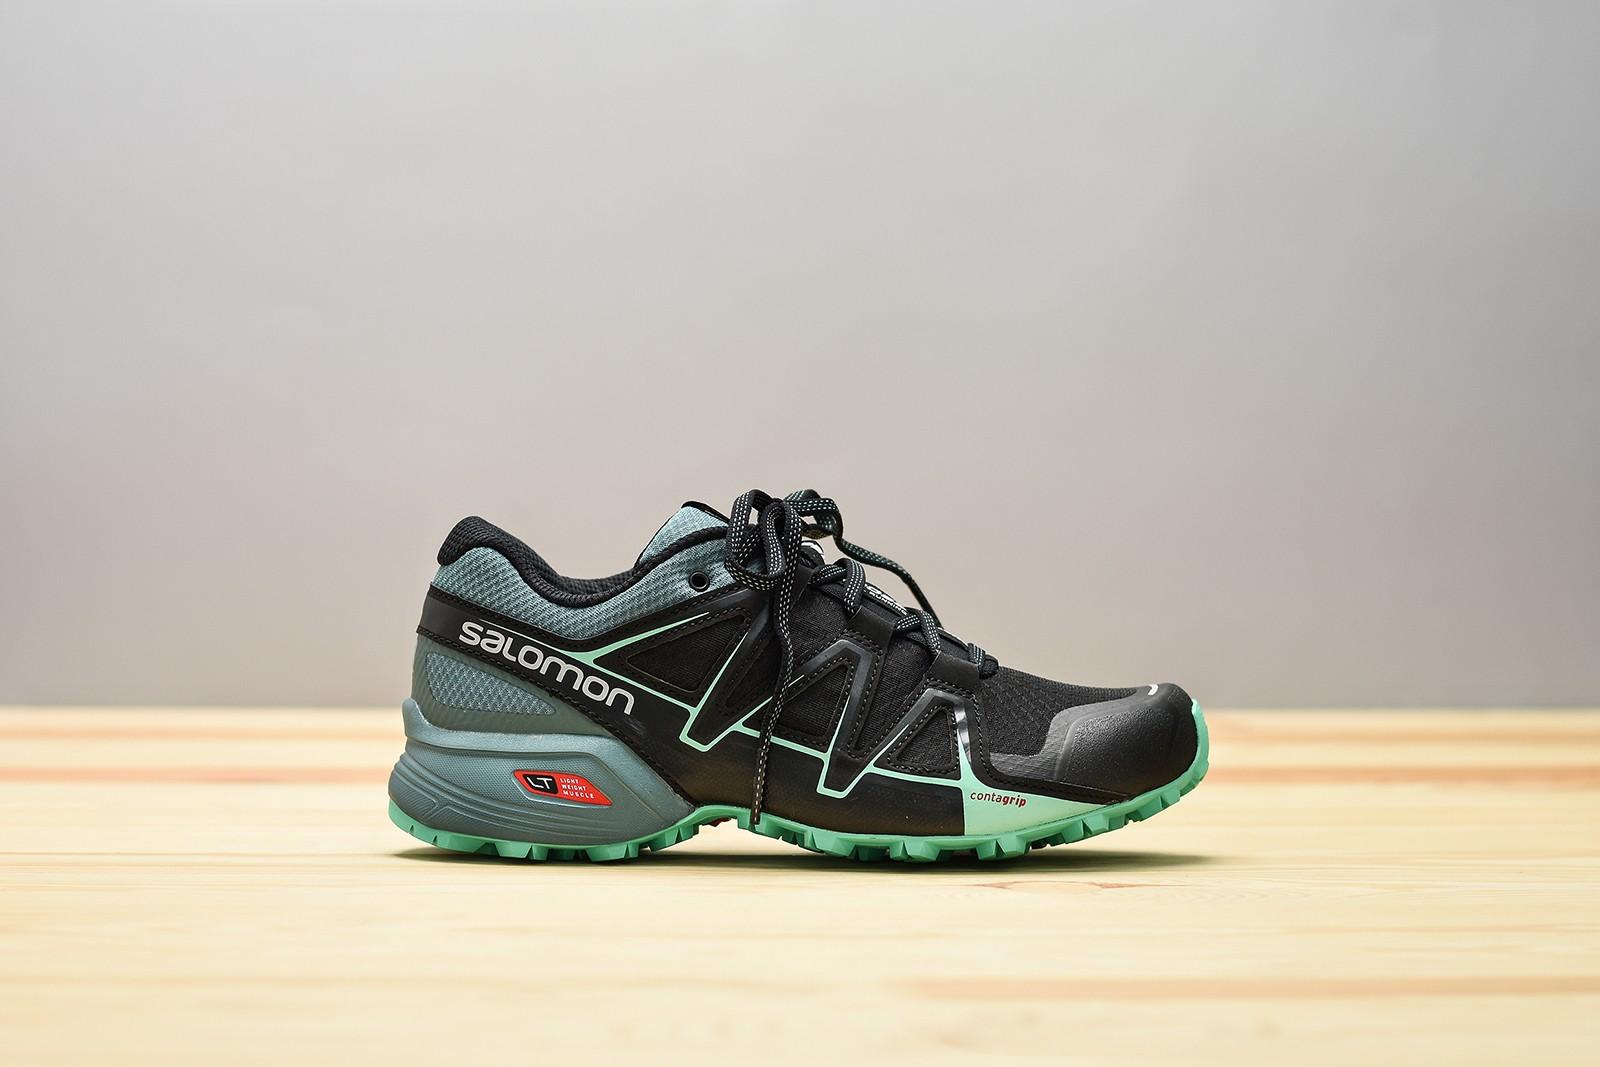 Dámské Běžecké boty Salomon SPEEDCROSS VARIO 2 W Bk North  d4fd5435c1